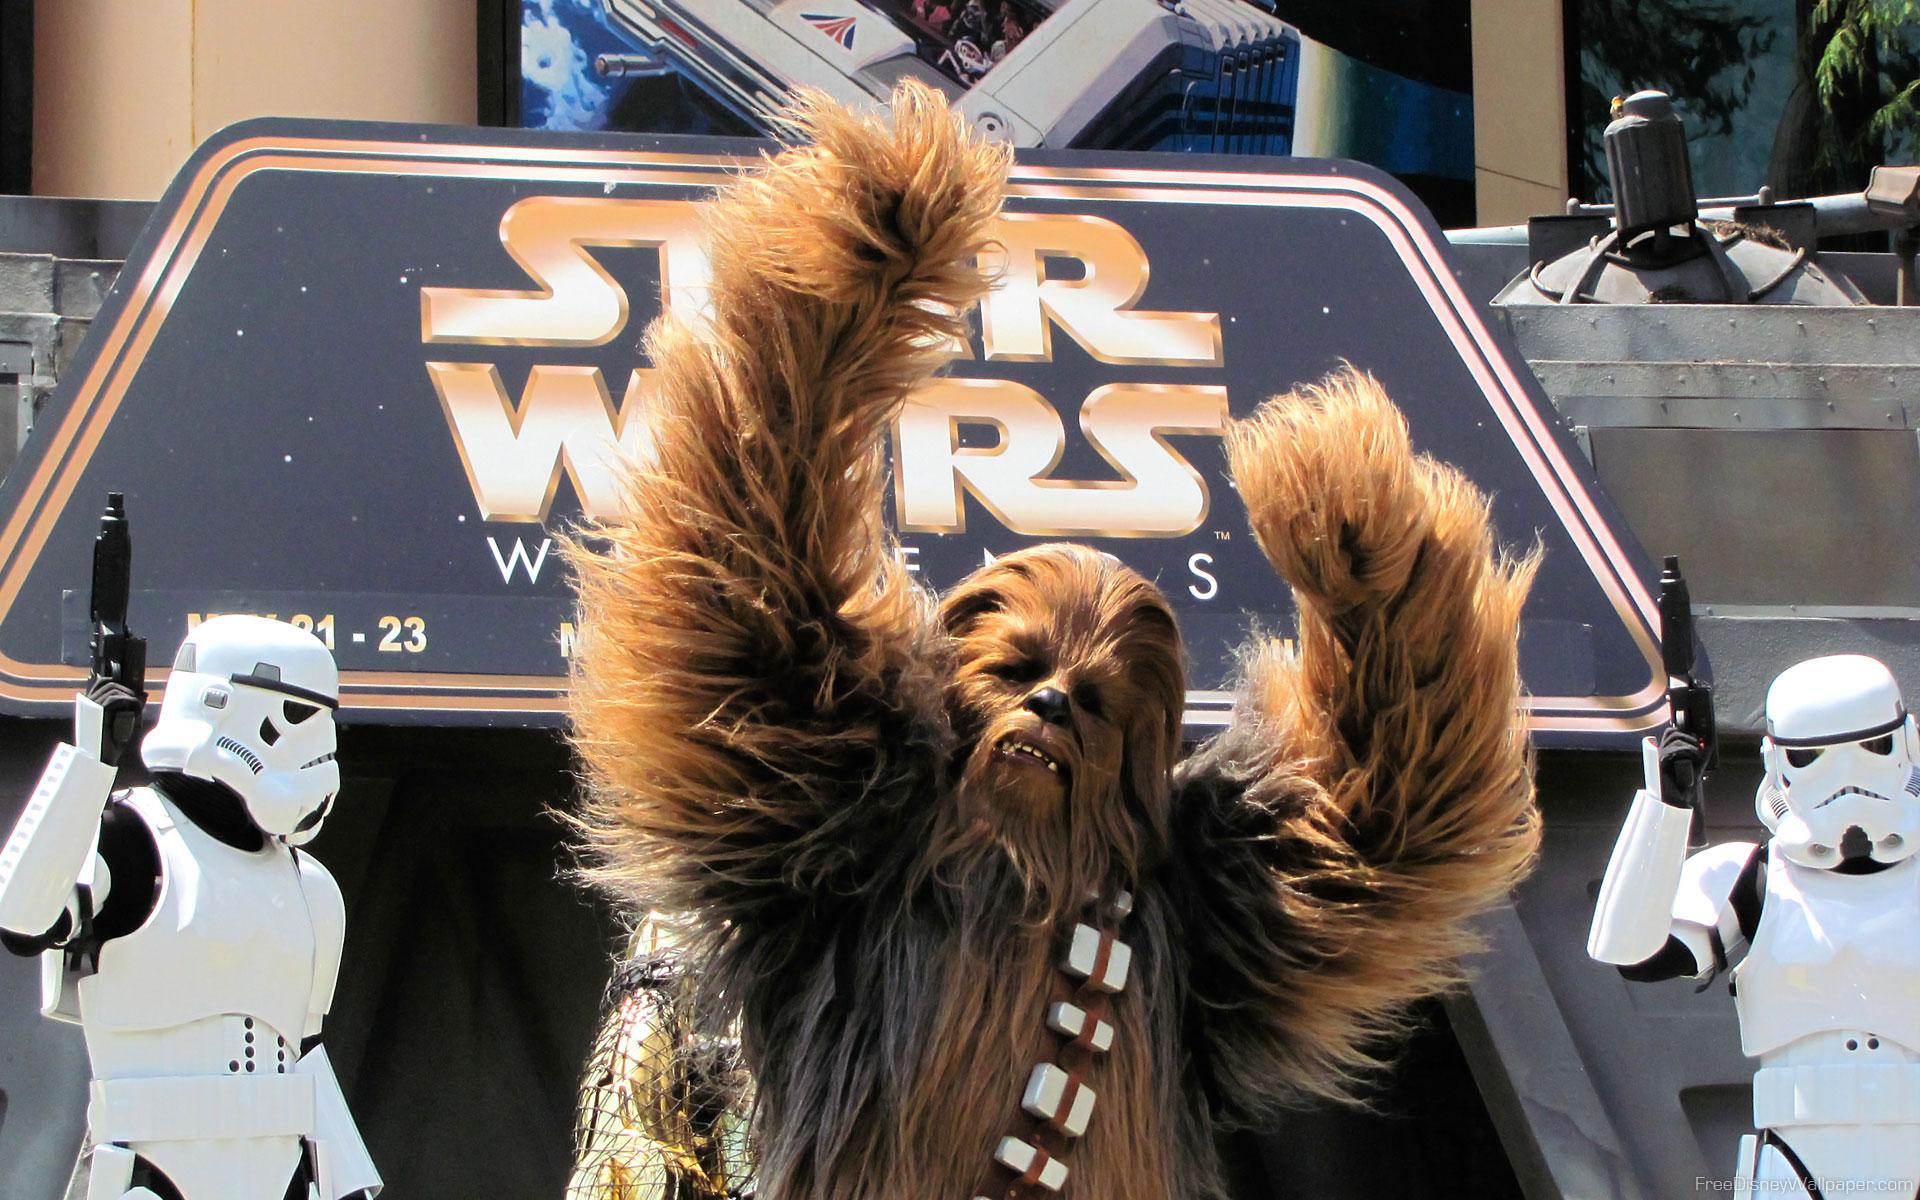 Chewbacca Star Wars Wallpaper Chewbacca 1920x1200